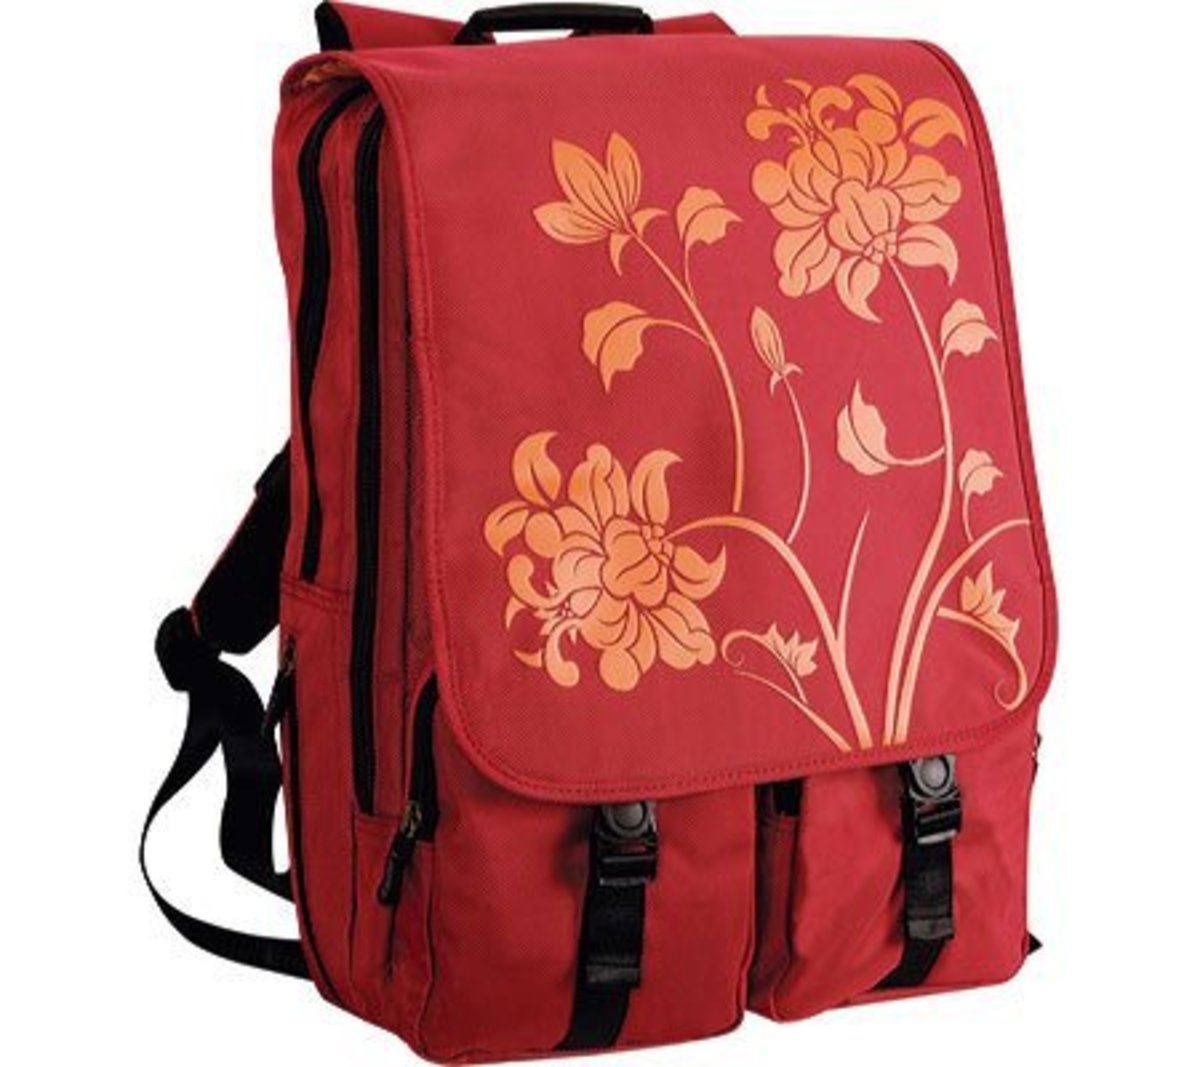 Laurex 17-Inch Women's Laptop Backpack